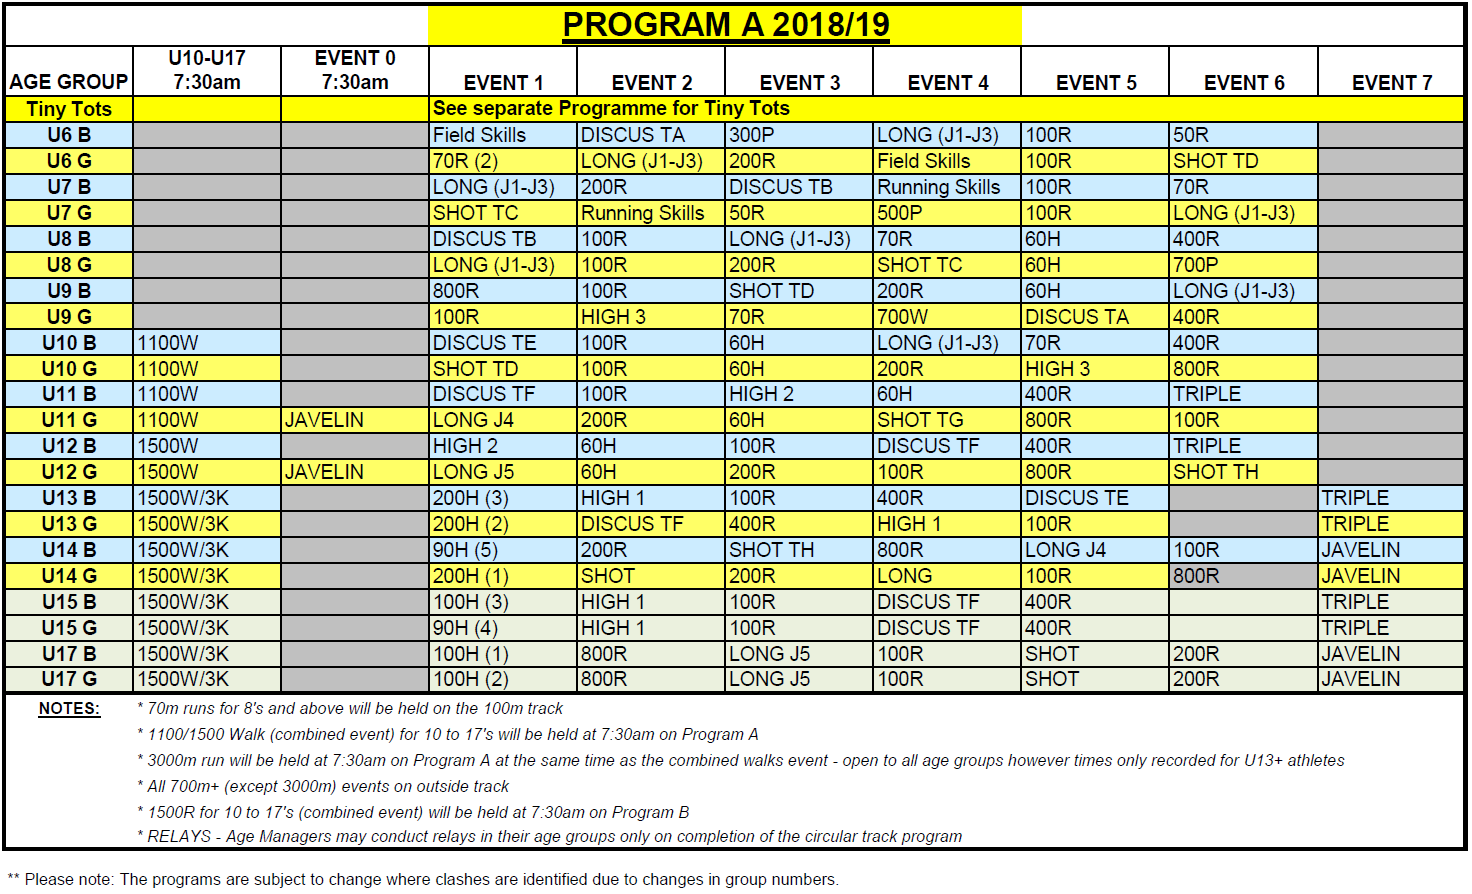 WHLAC PROGRAM A 2018-19